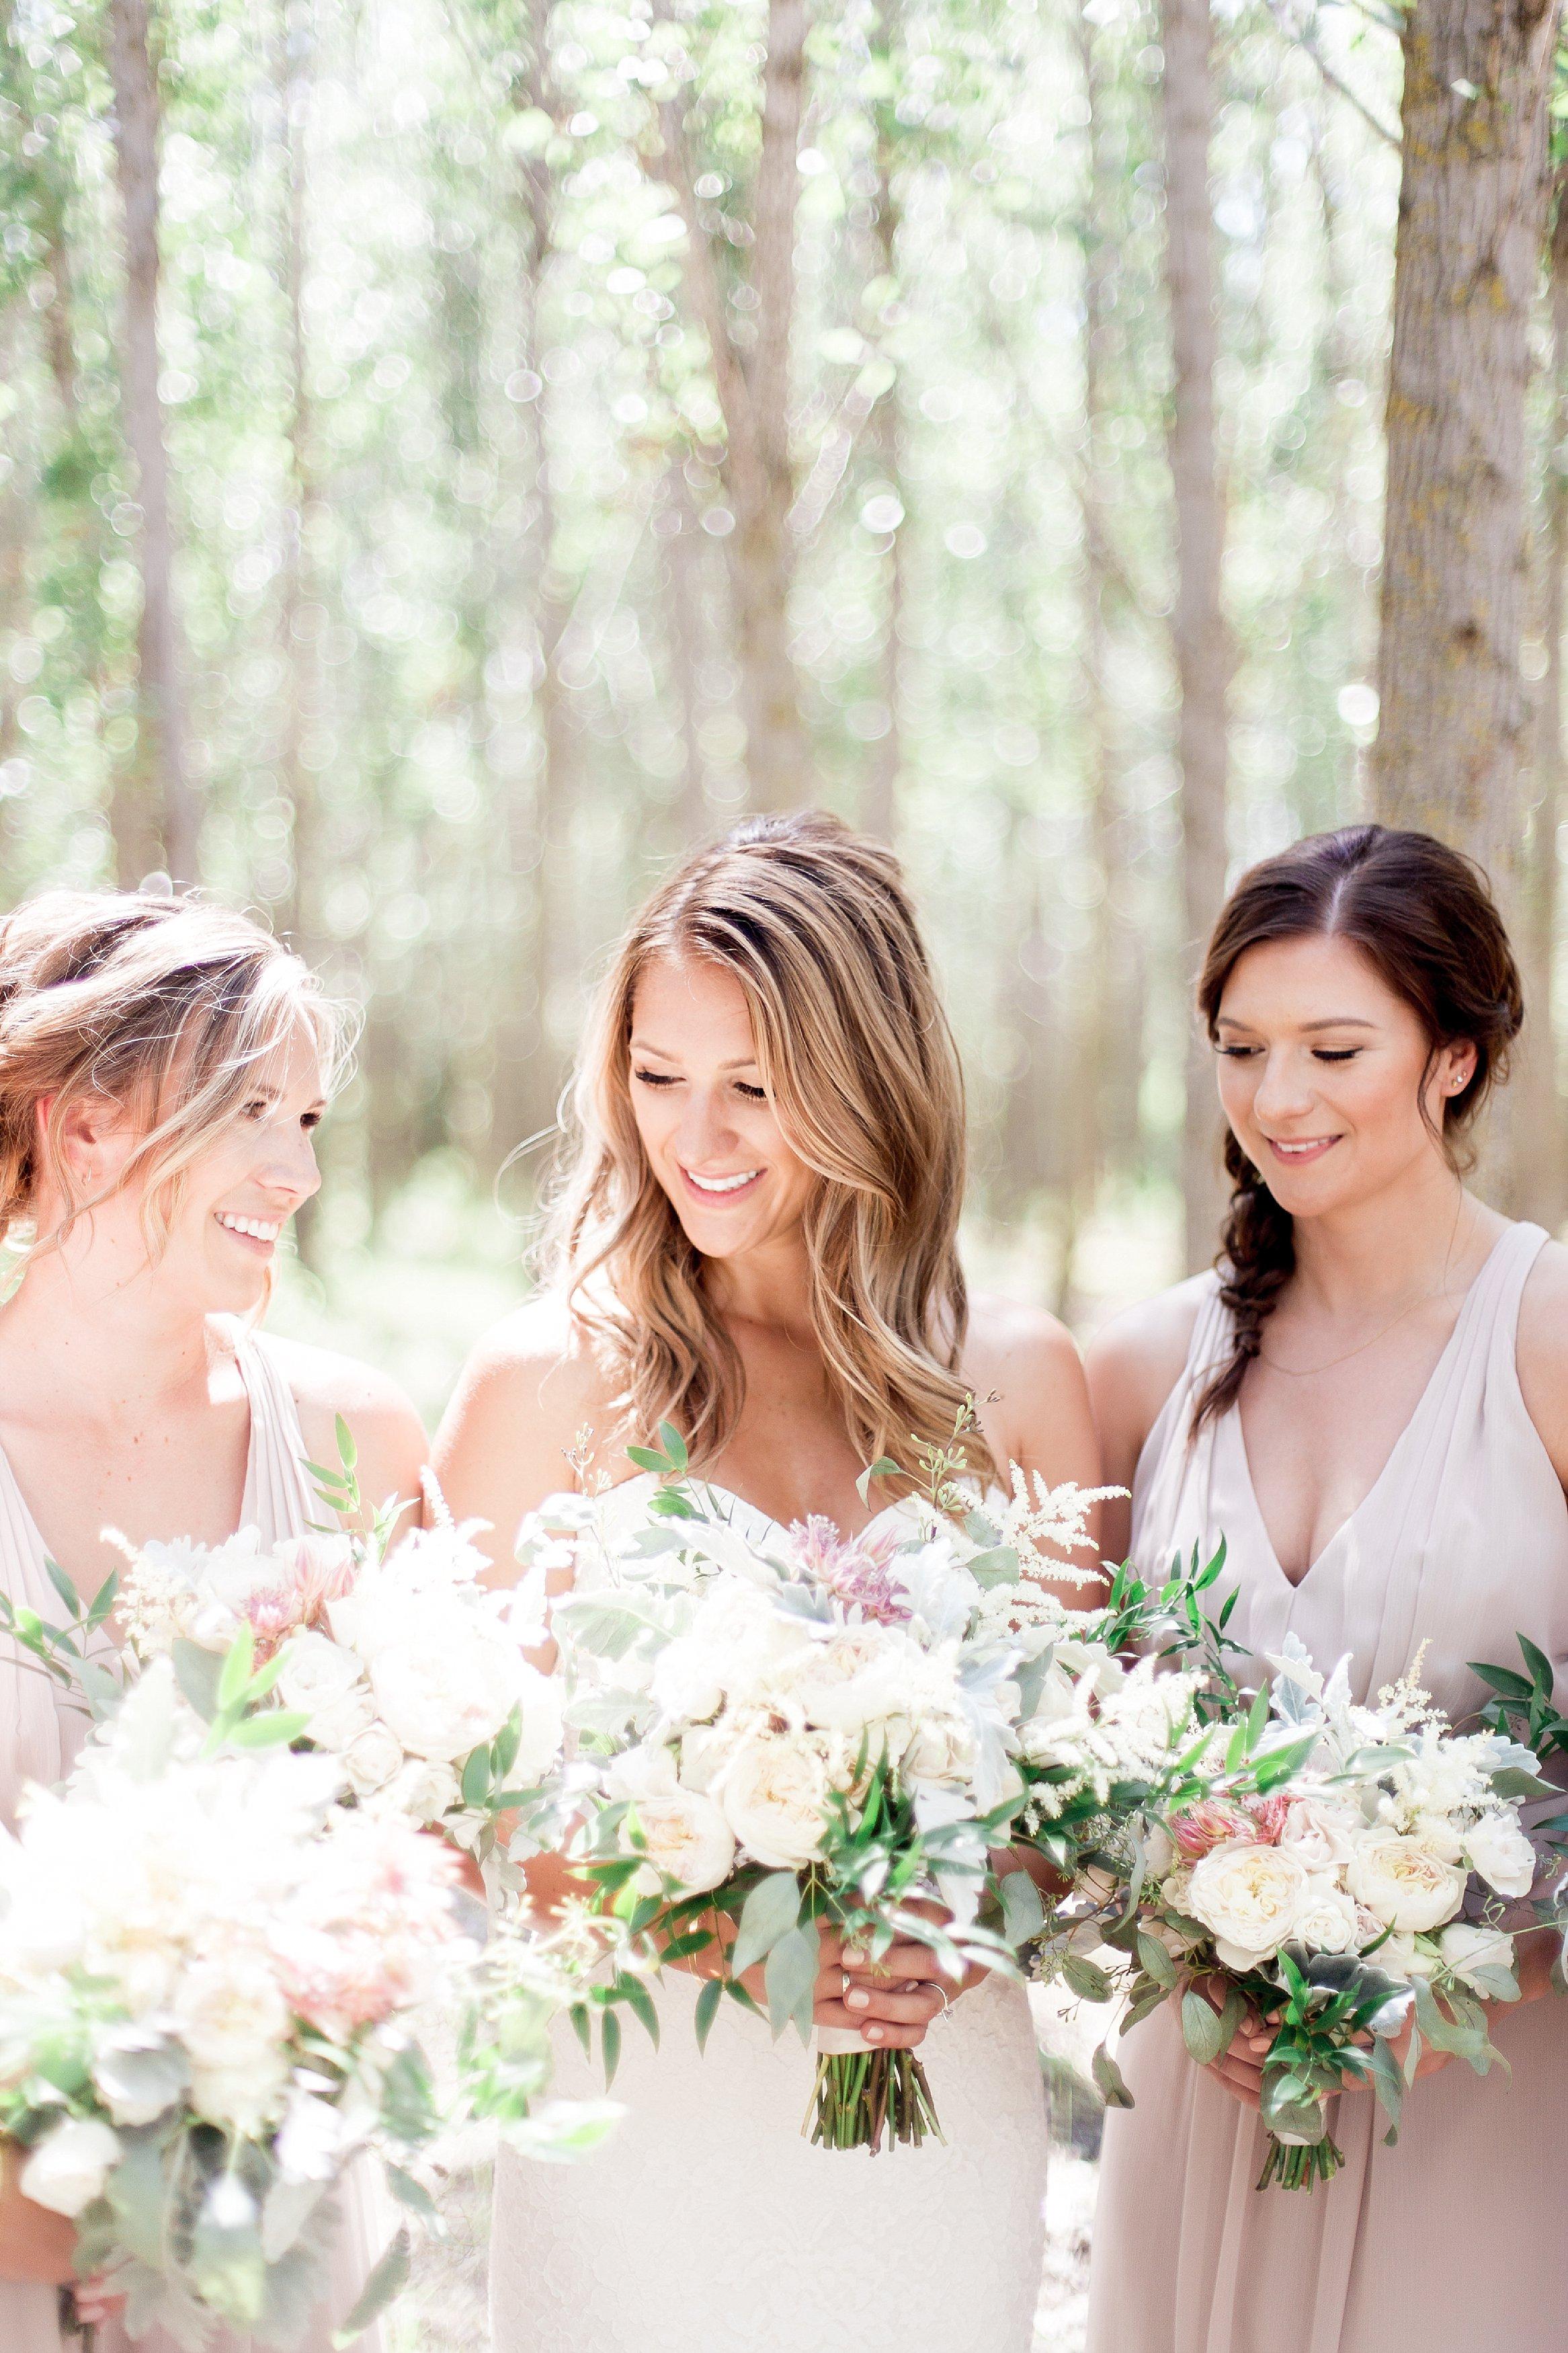 Winnipeg Wedding Photographer film photographer Keila Marie Photography   Bridesmaids photos   bridesmaid blush dresses